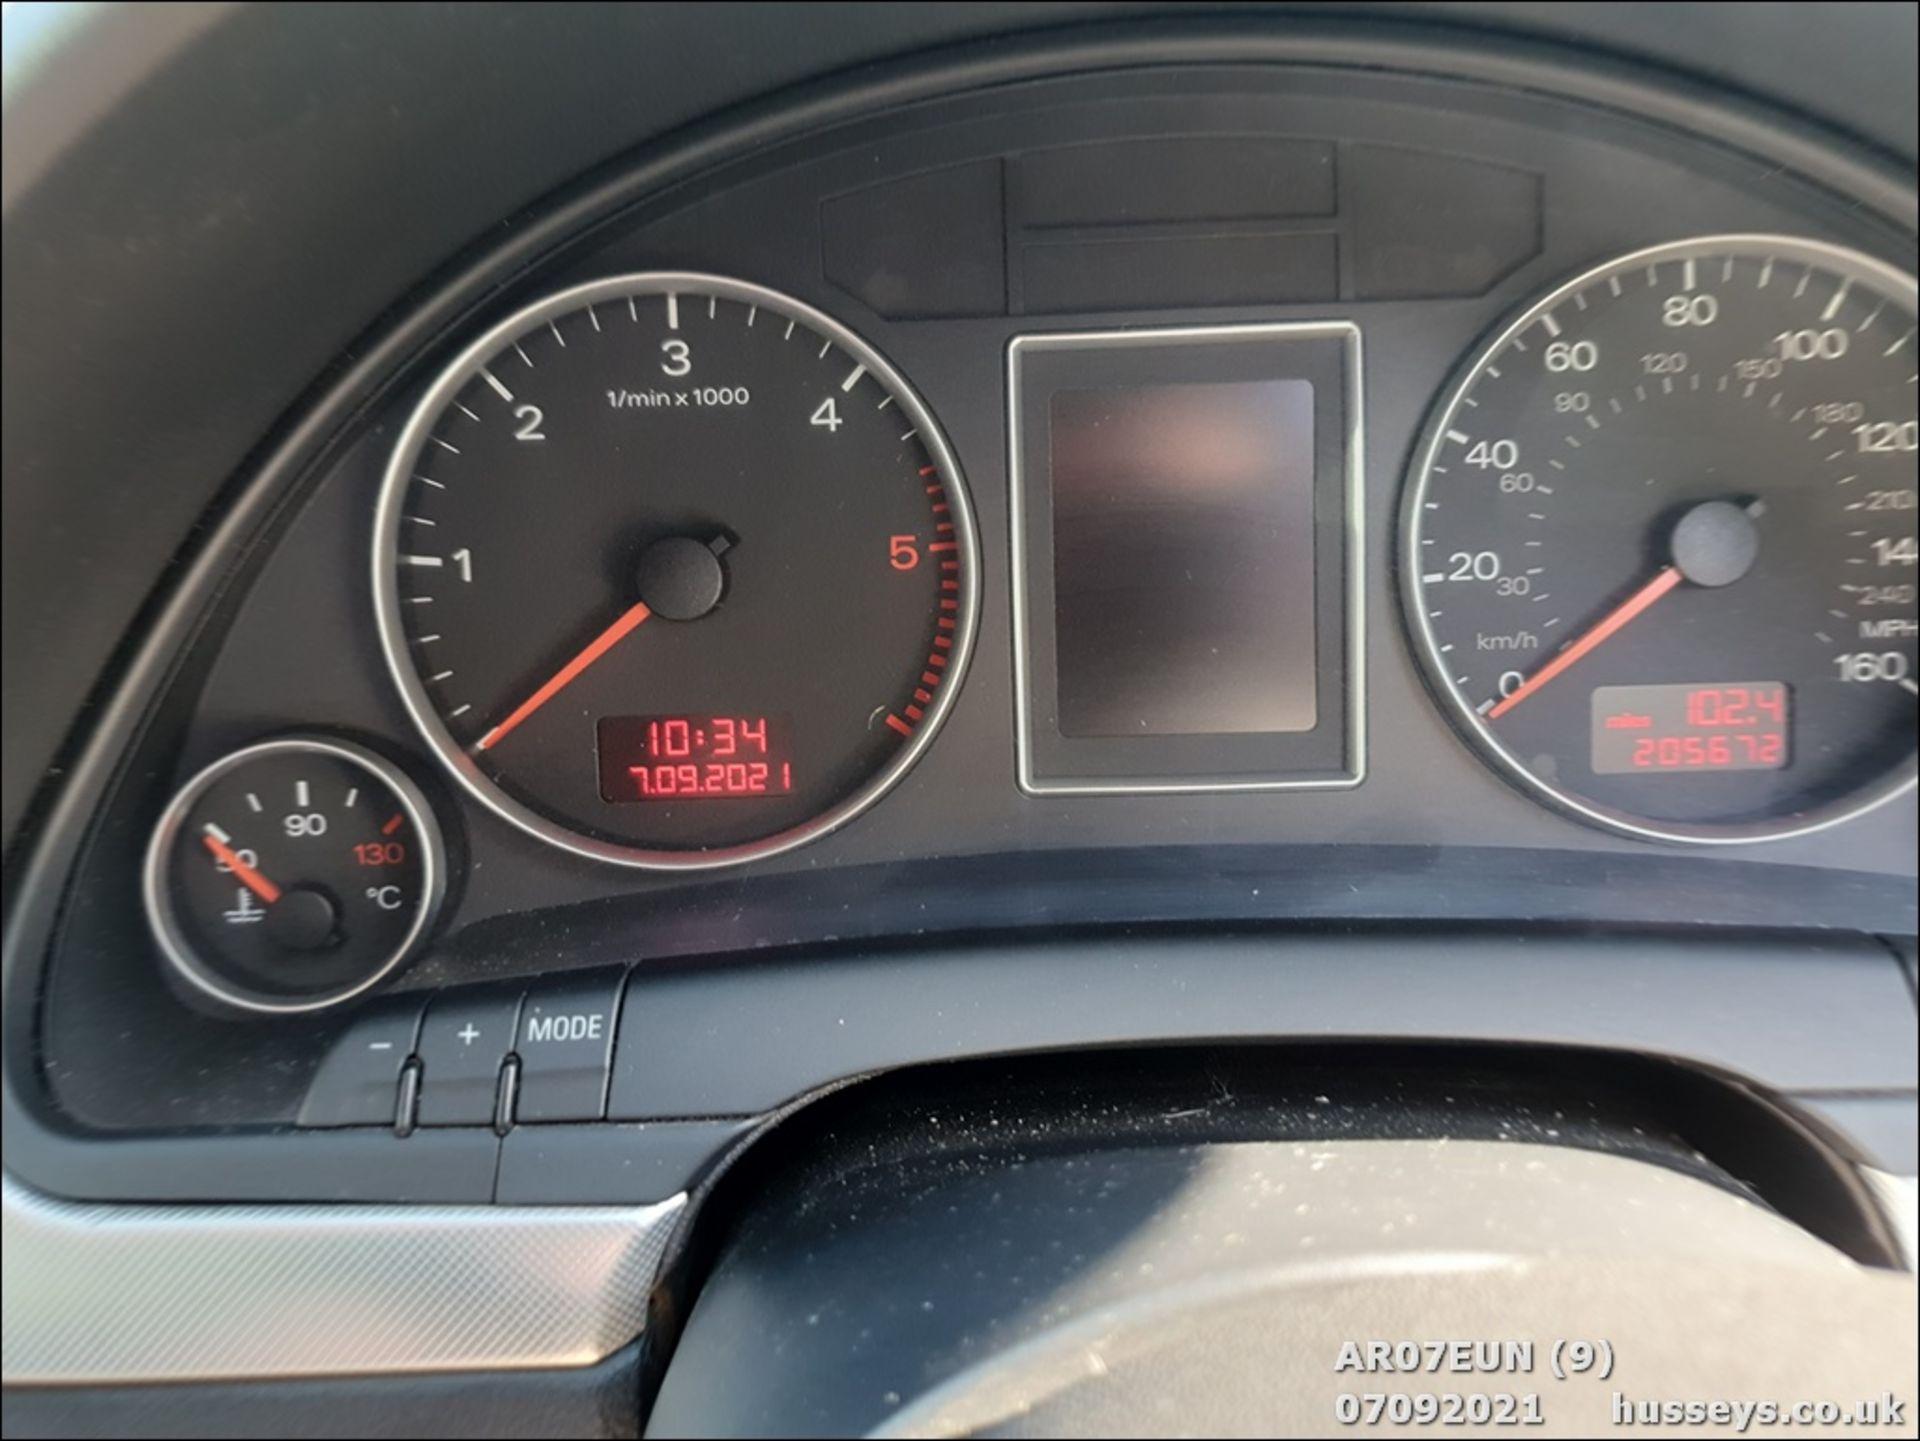 07/07 AUDI A4 AVANT S LINE TDI 140 - 1968cc 5dr Estate (Grey, 205k) - Image 10 of 17